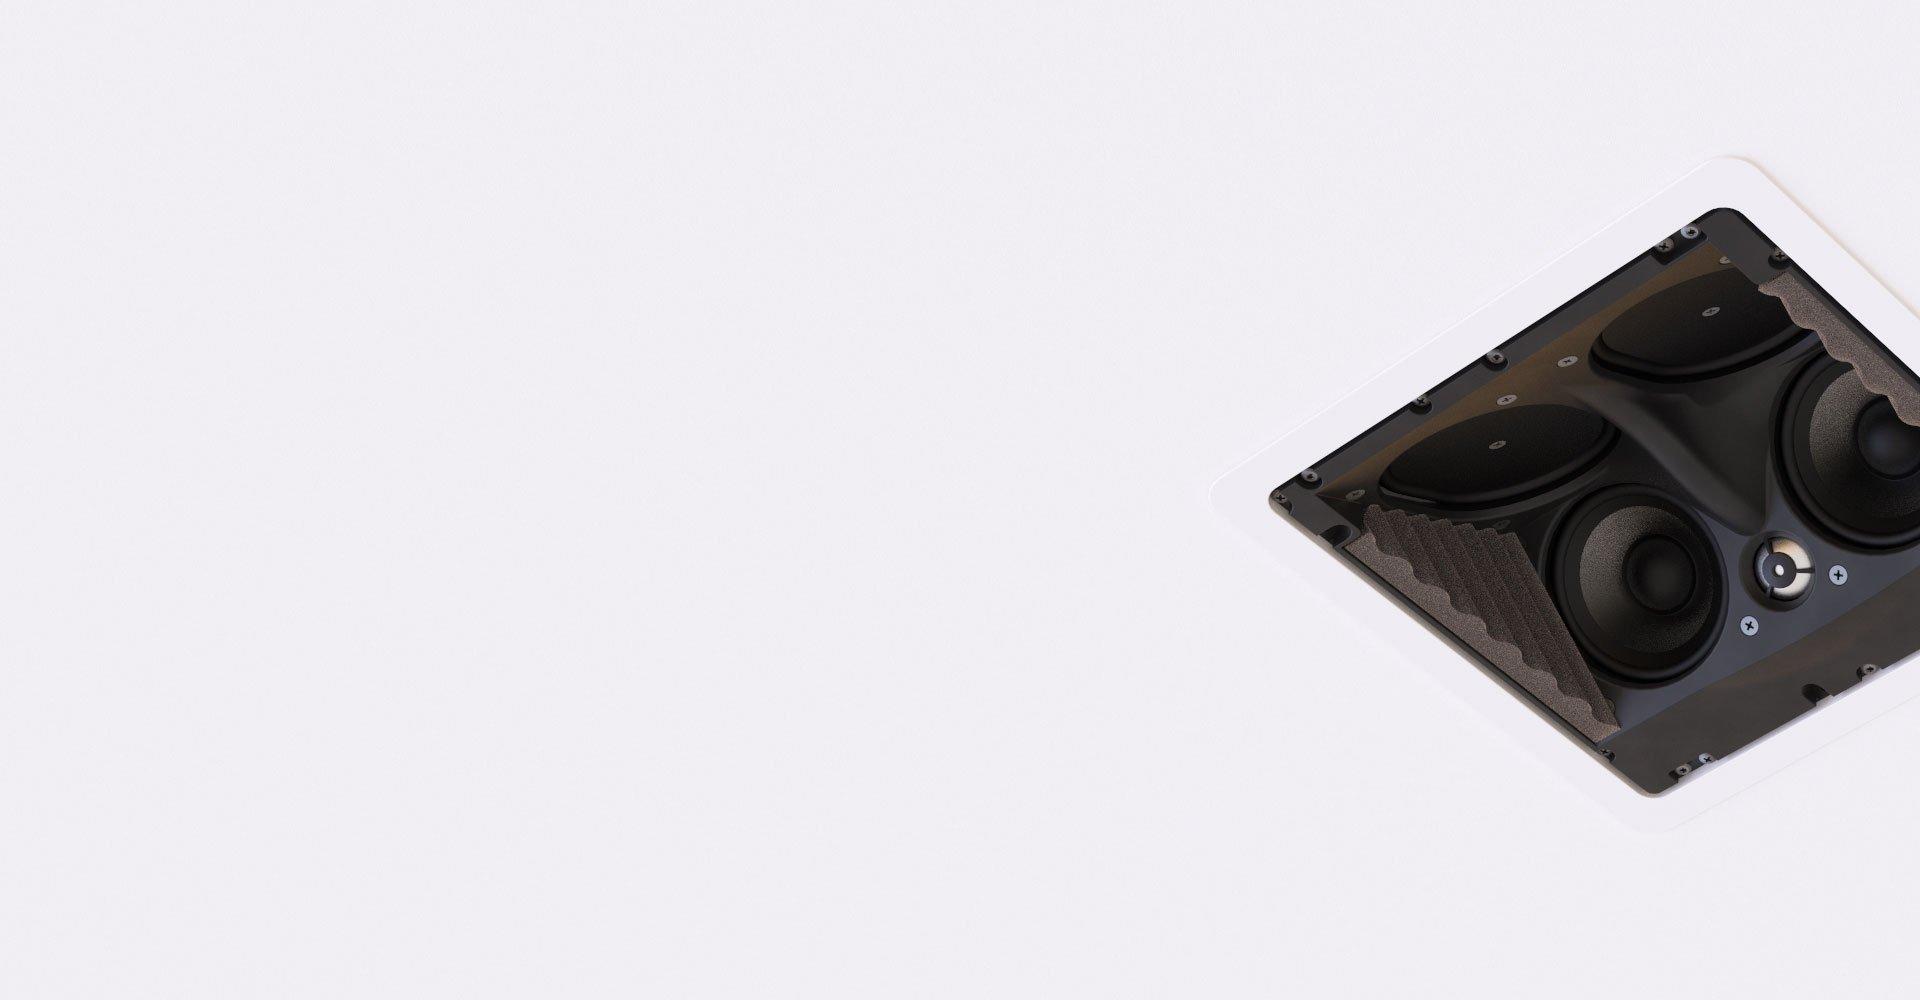 Enceinte encastrée plafond